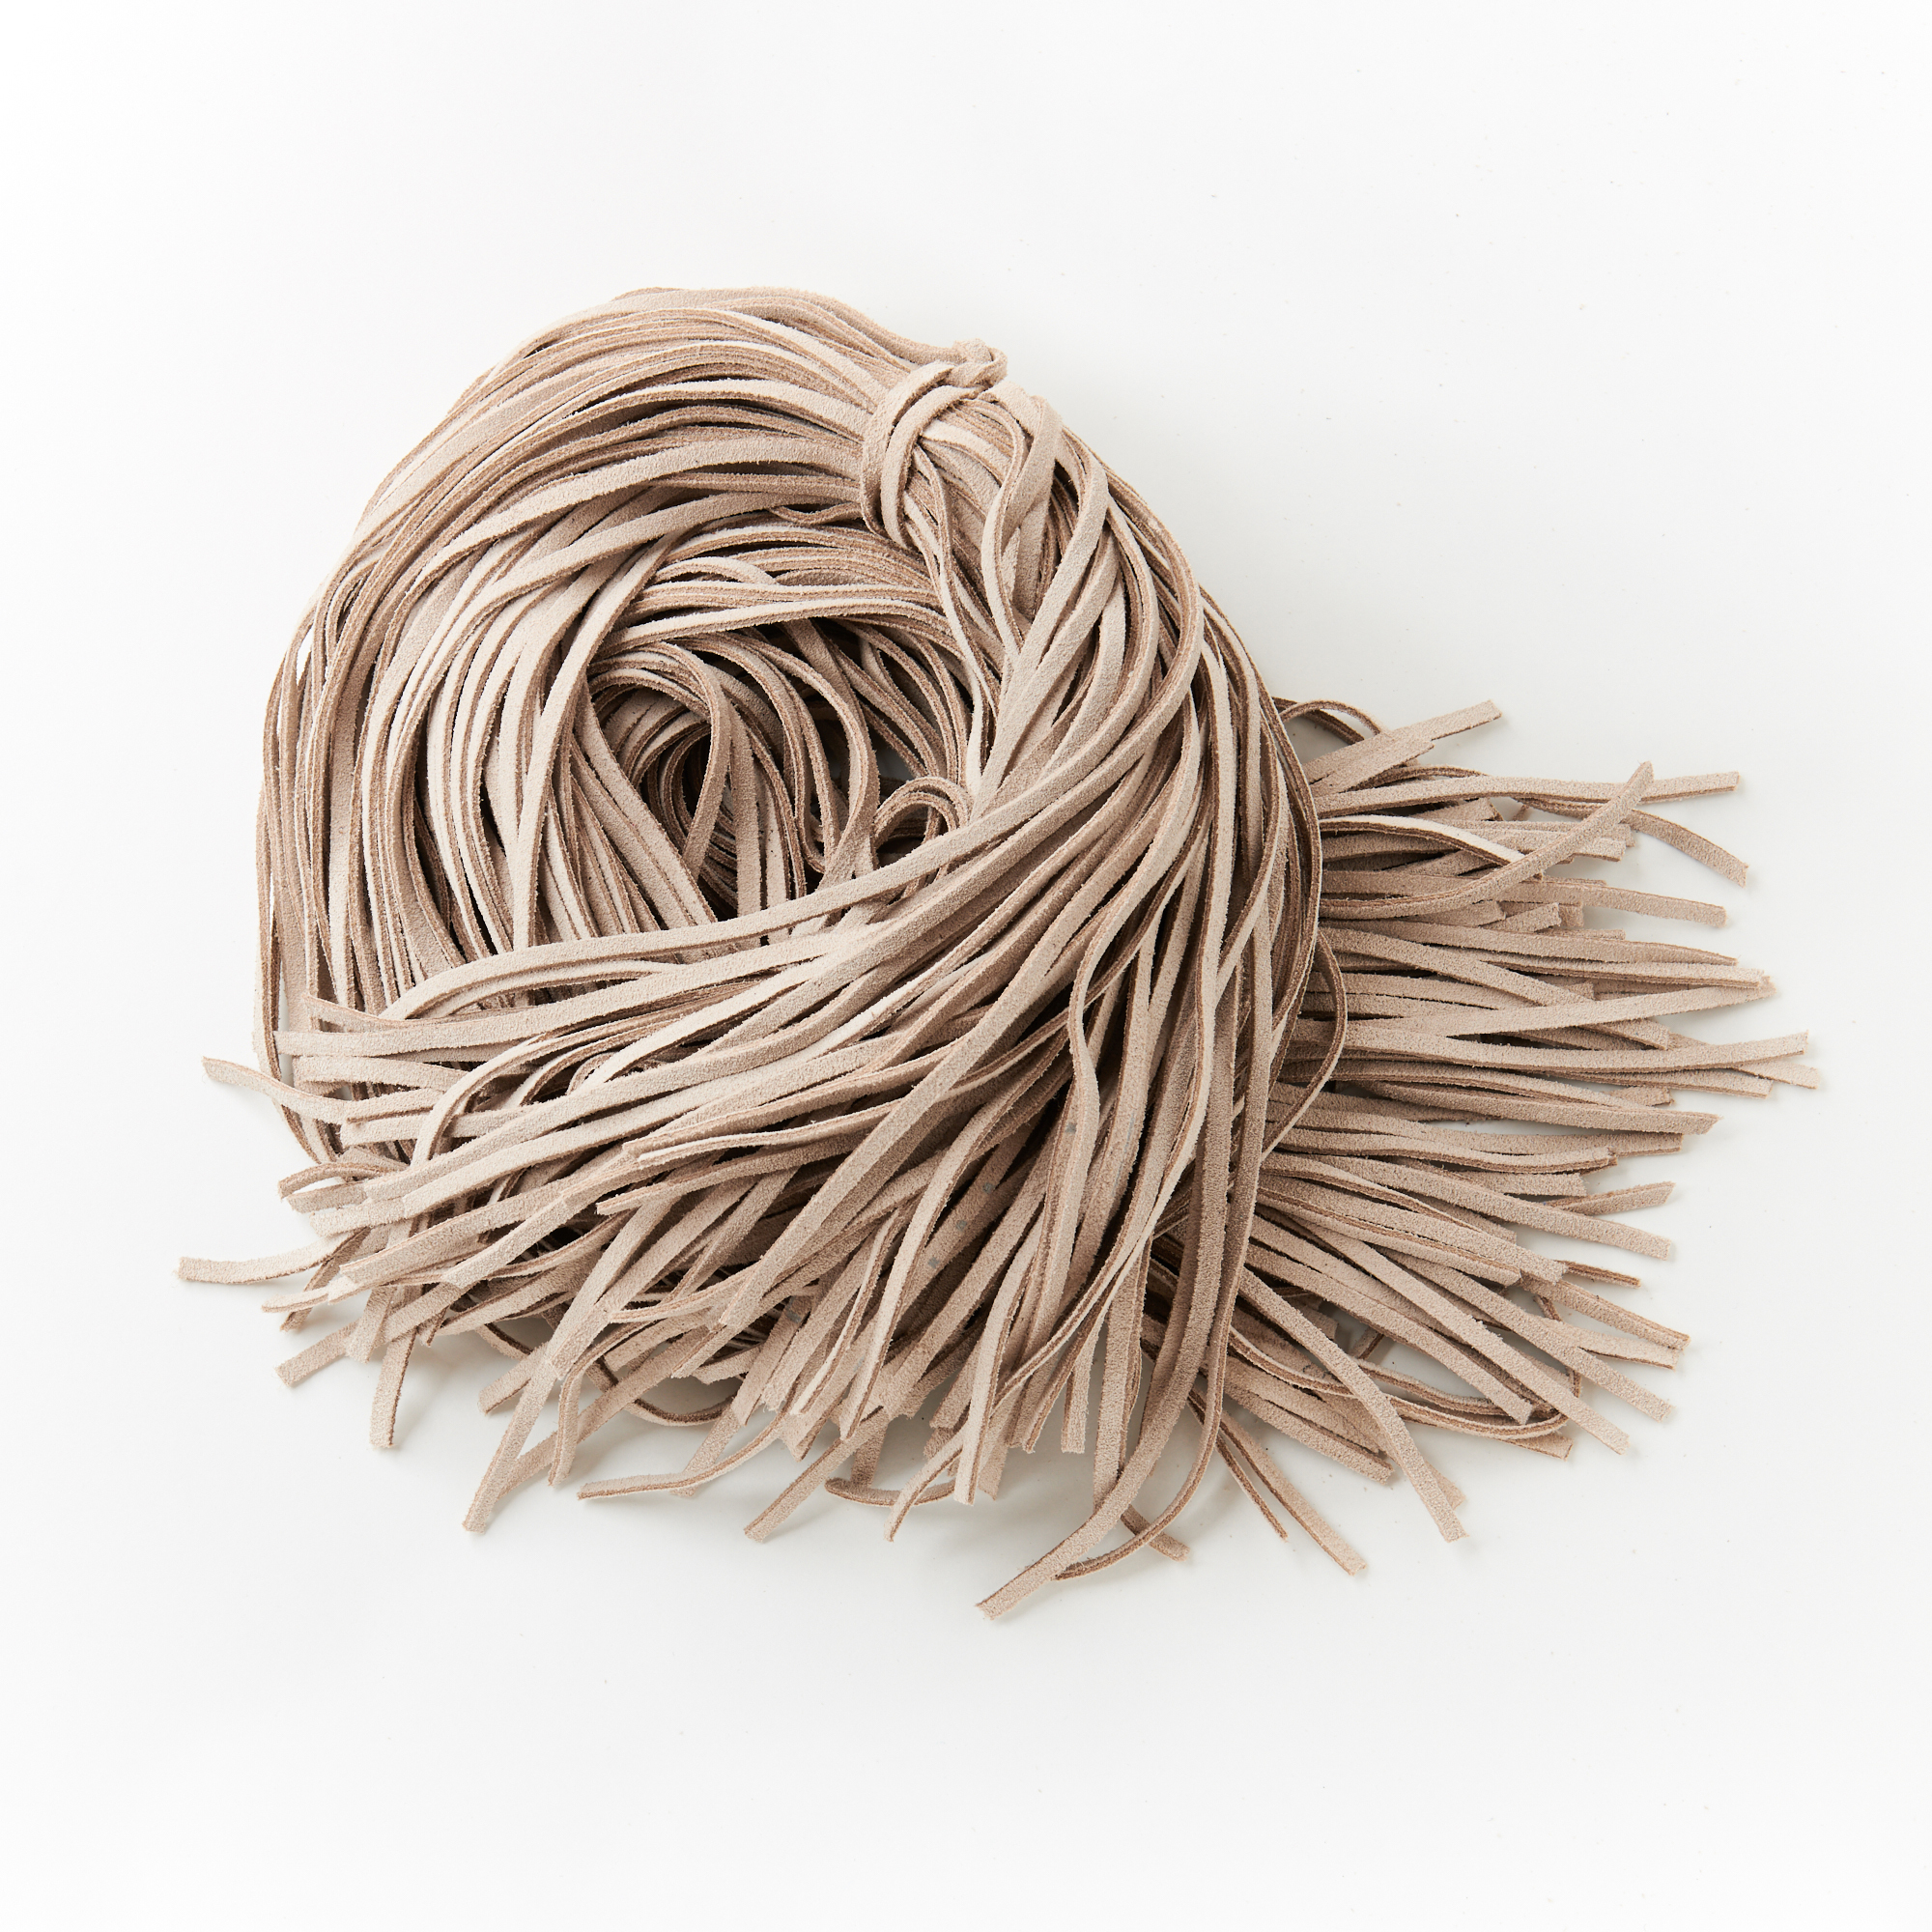 Lederband, Flachriemen, Flechtriemen aus Veloursleder 4mm breit.